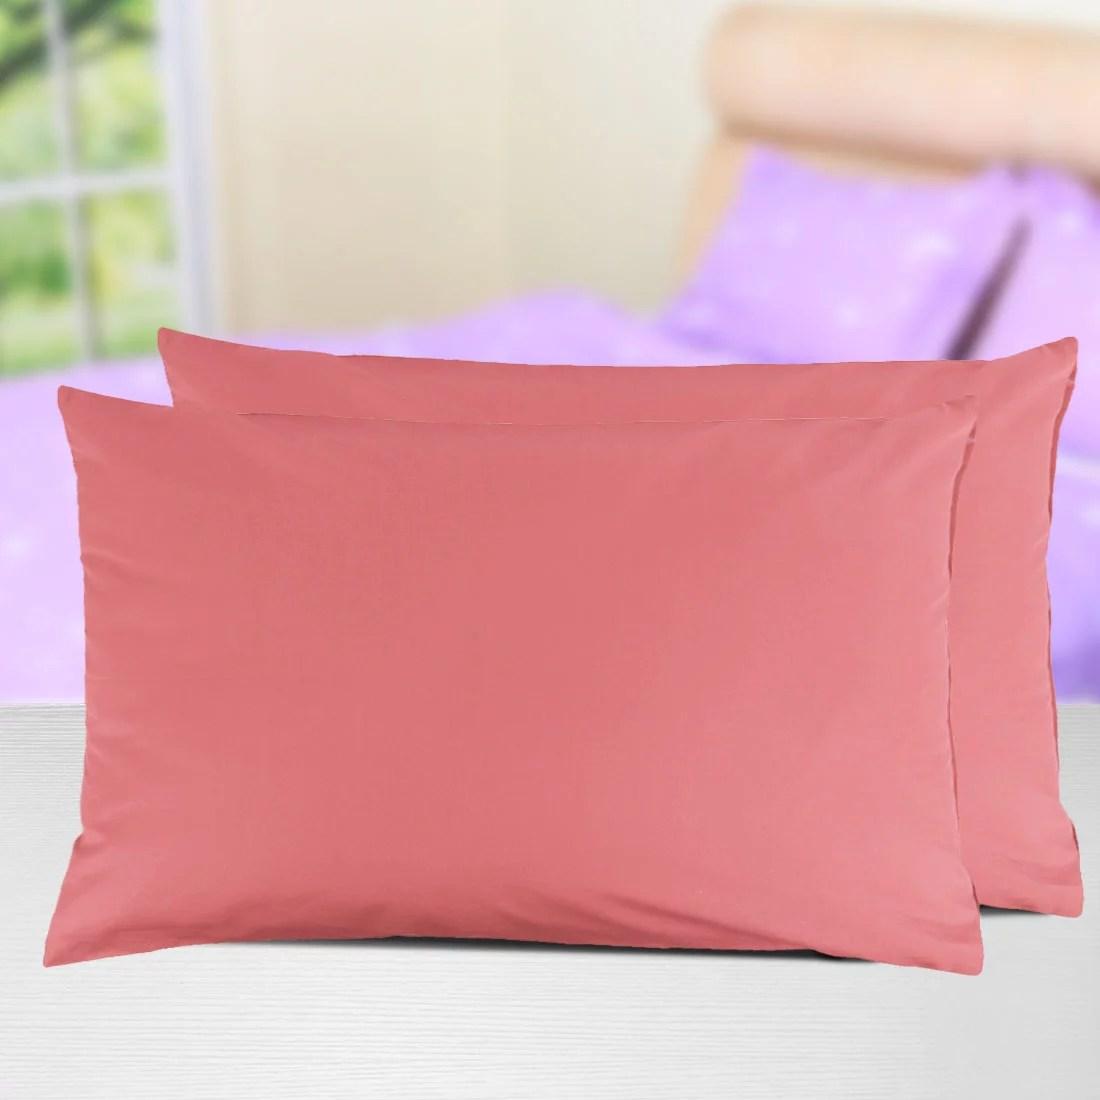 2 pcs egyptian cotton zippered pillow cases piccocasa